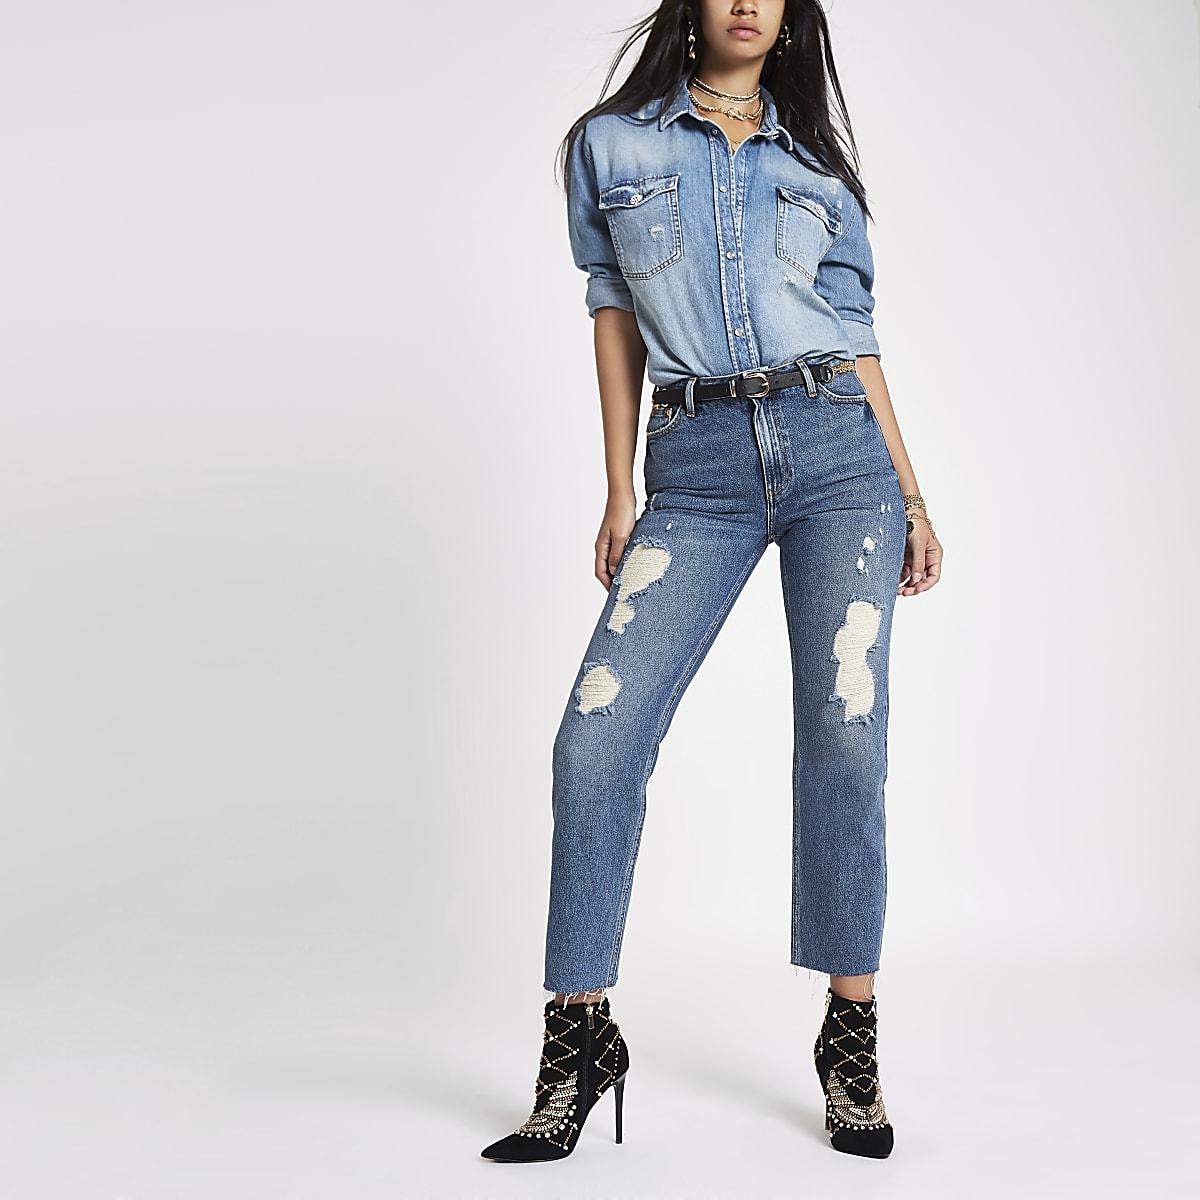 RI 30 - Middenblauwe ripped denim boyfriend jeans